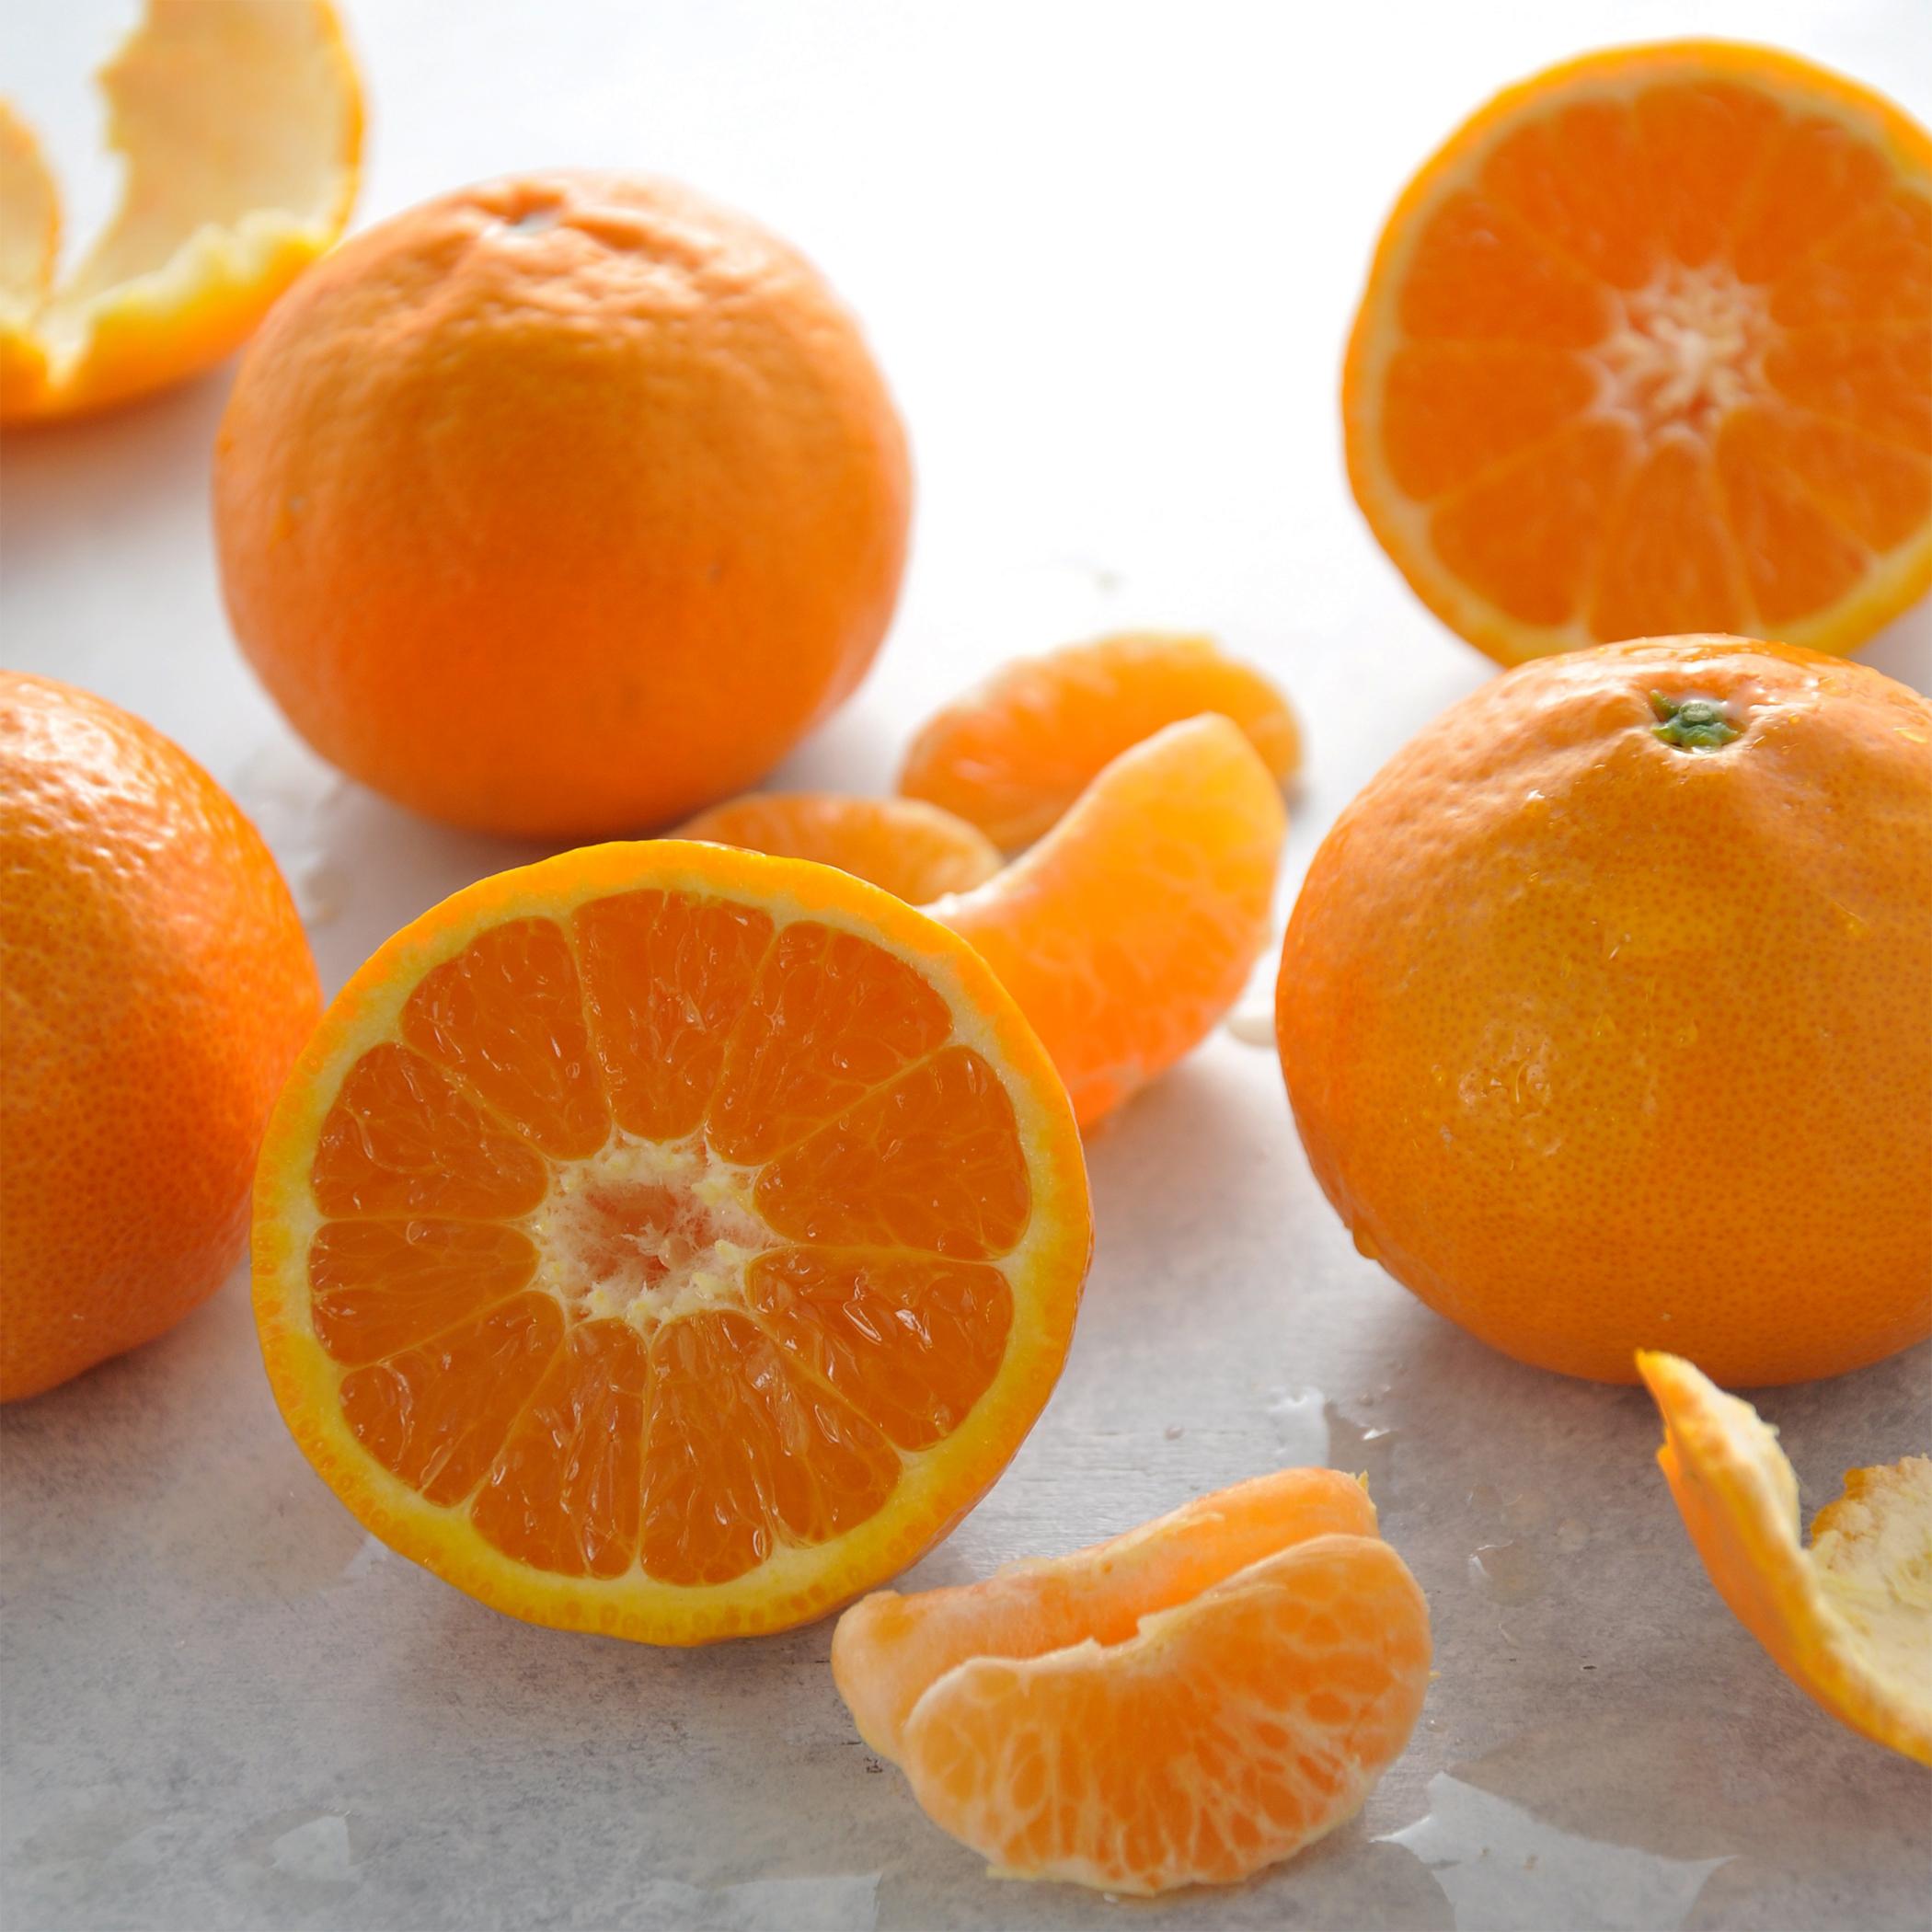 Ojai Pixie Tangerines   Meet the Farmer